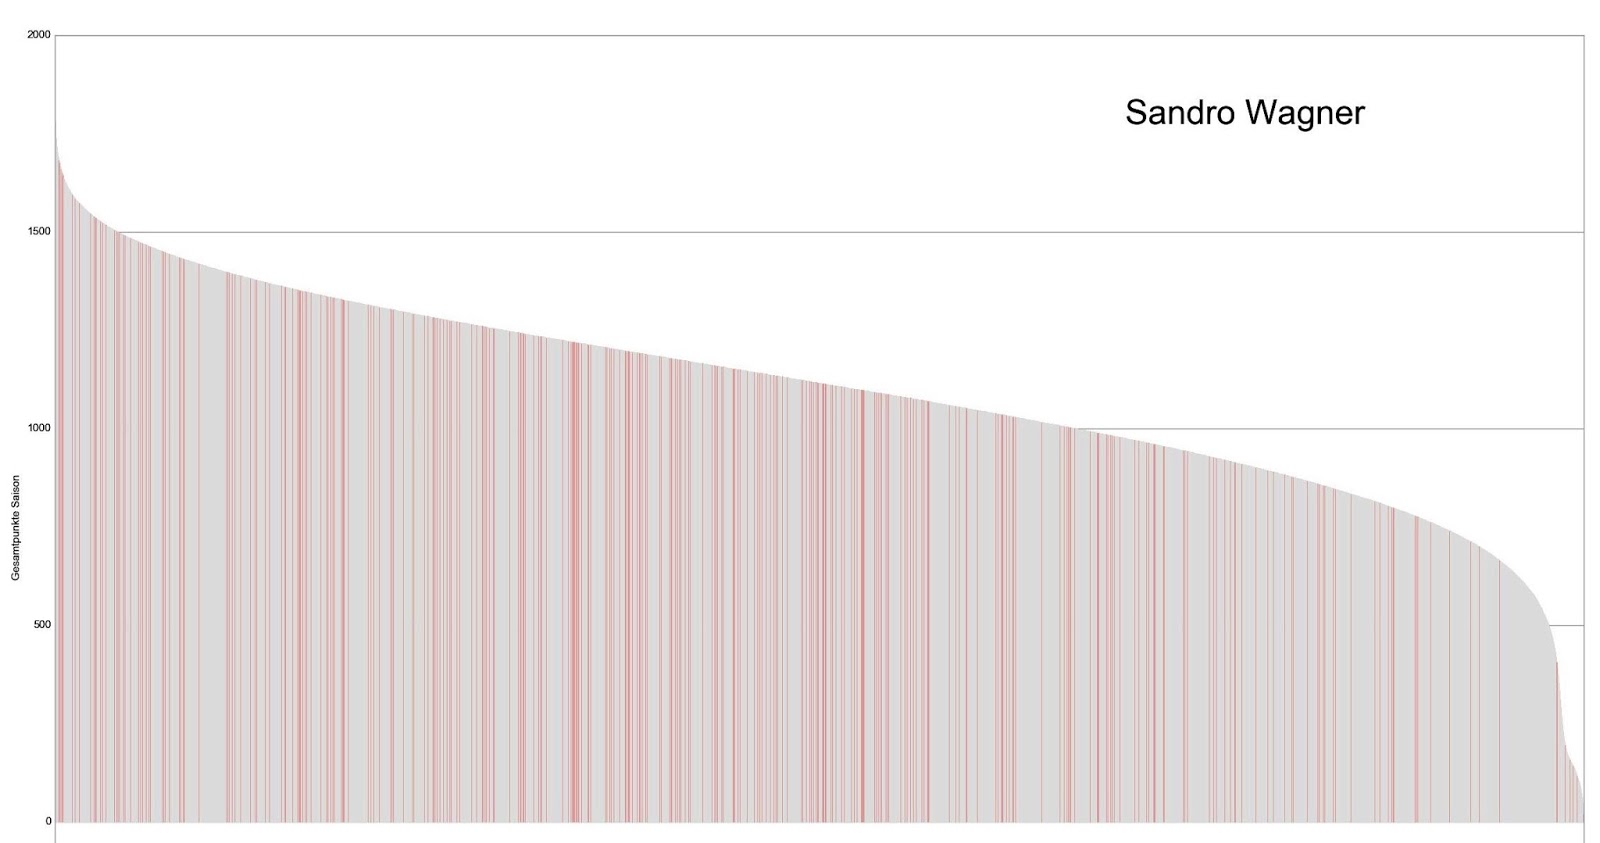 Kicker Manager Liga Saison 2016/17 - Zahlen, Daten, Fakten | IceSea Data